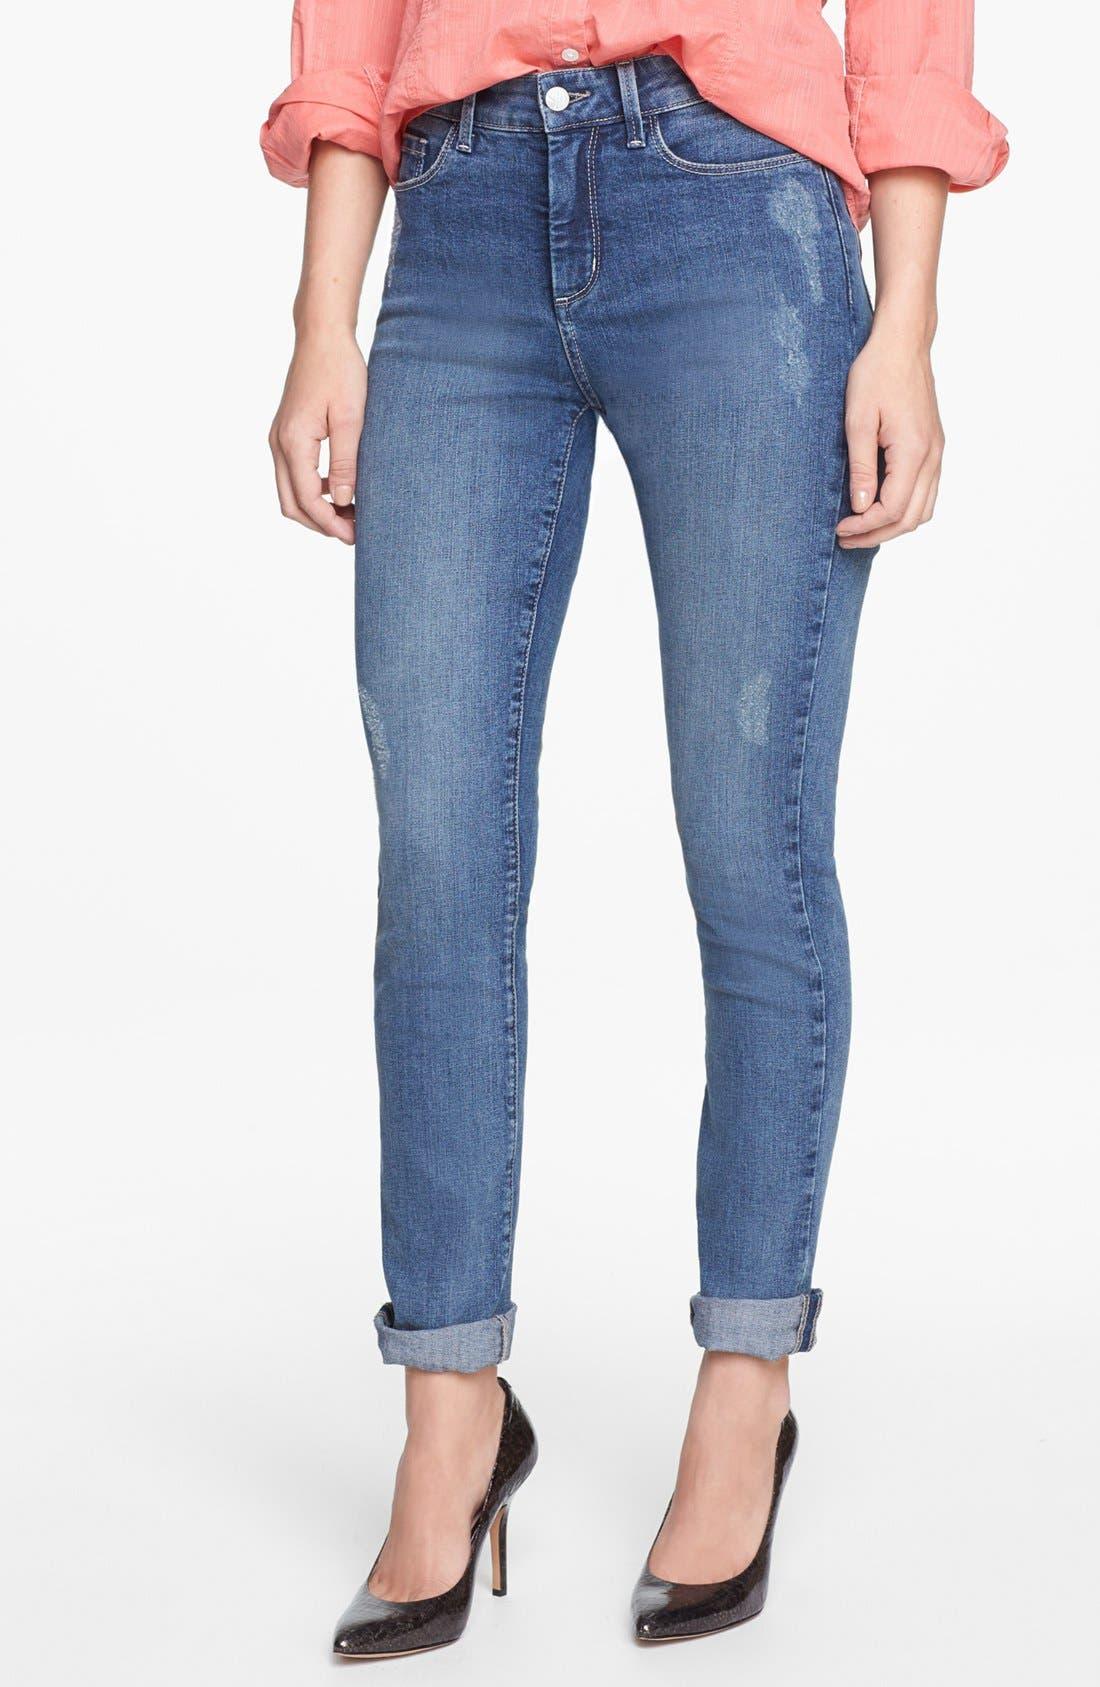 Main Image - NYDJ 'Leann' Stretch Skinny Boyfriend Jeans (Lake Arrowhead) (Regular & Petite)